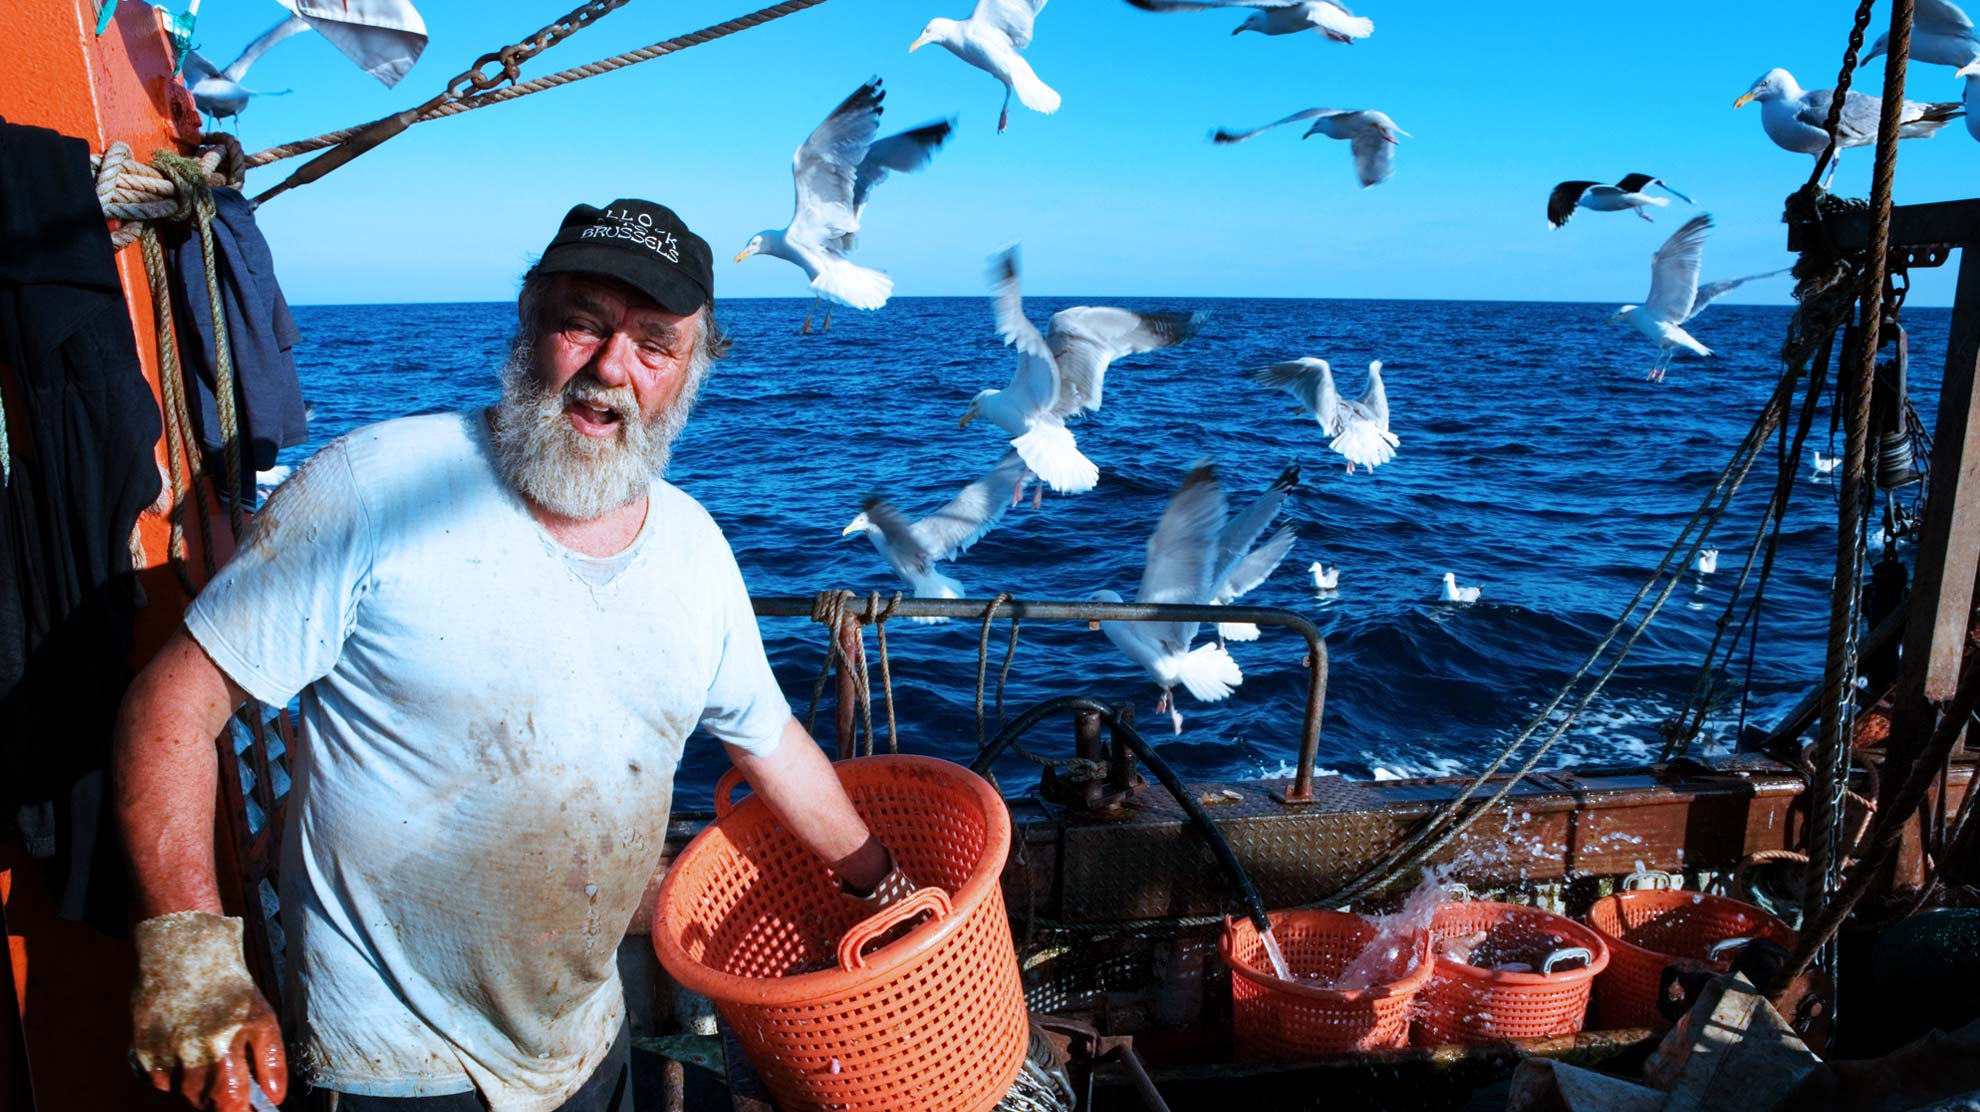 UK fishing industry eyes up more sustainable catches